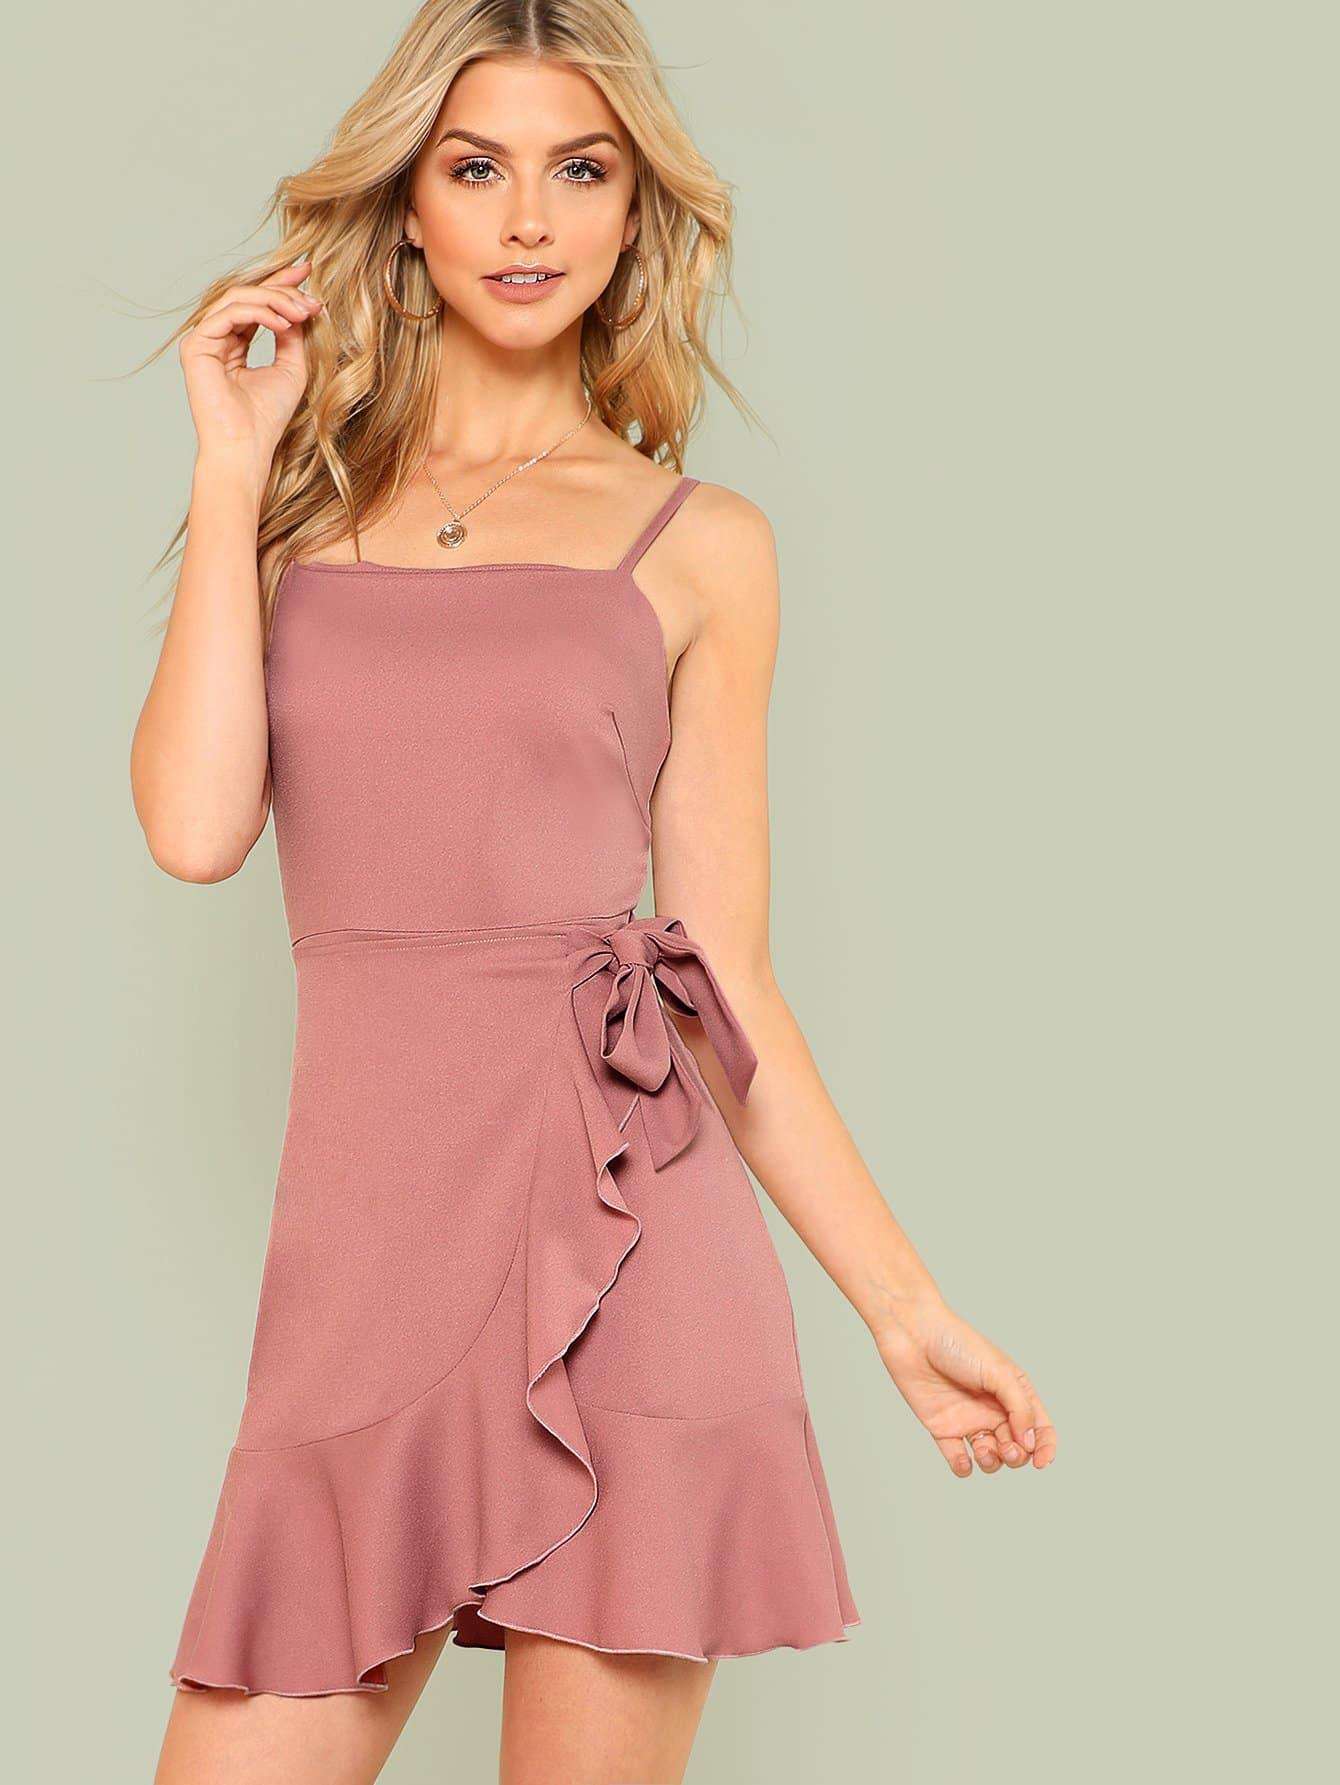 Ruffle Trim Overlap Hem Cami Dress ruffle trim overlap hem dress